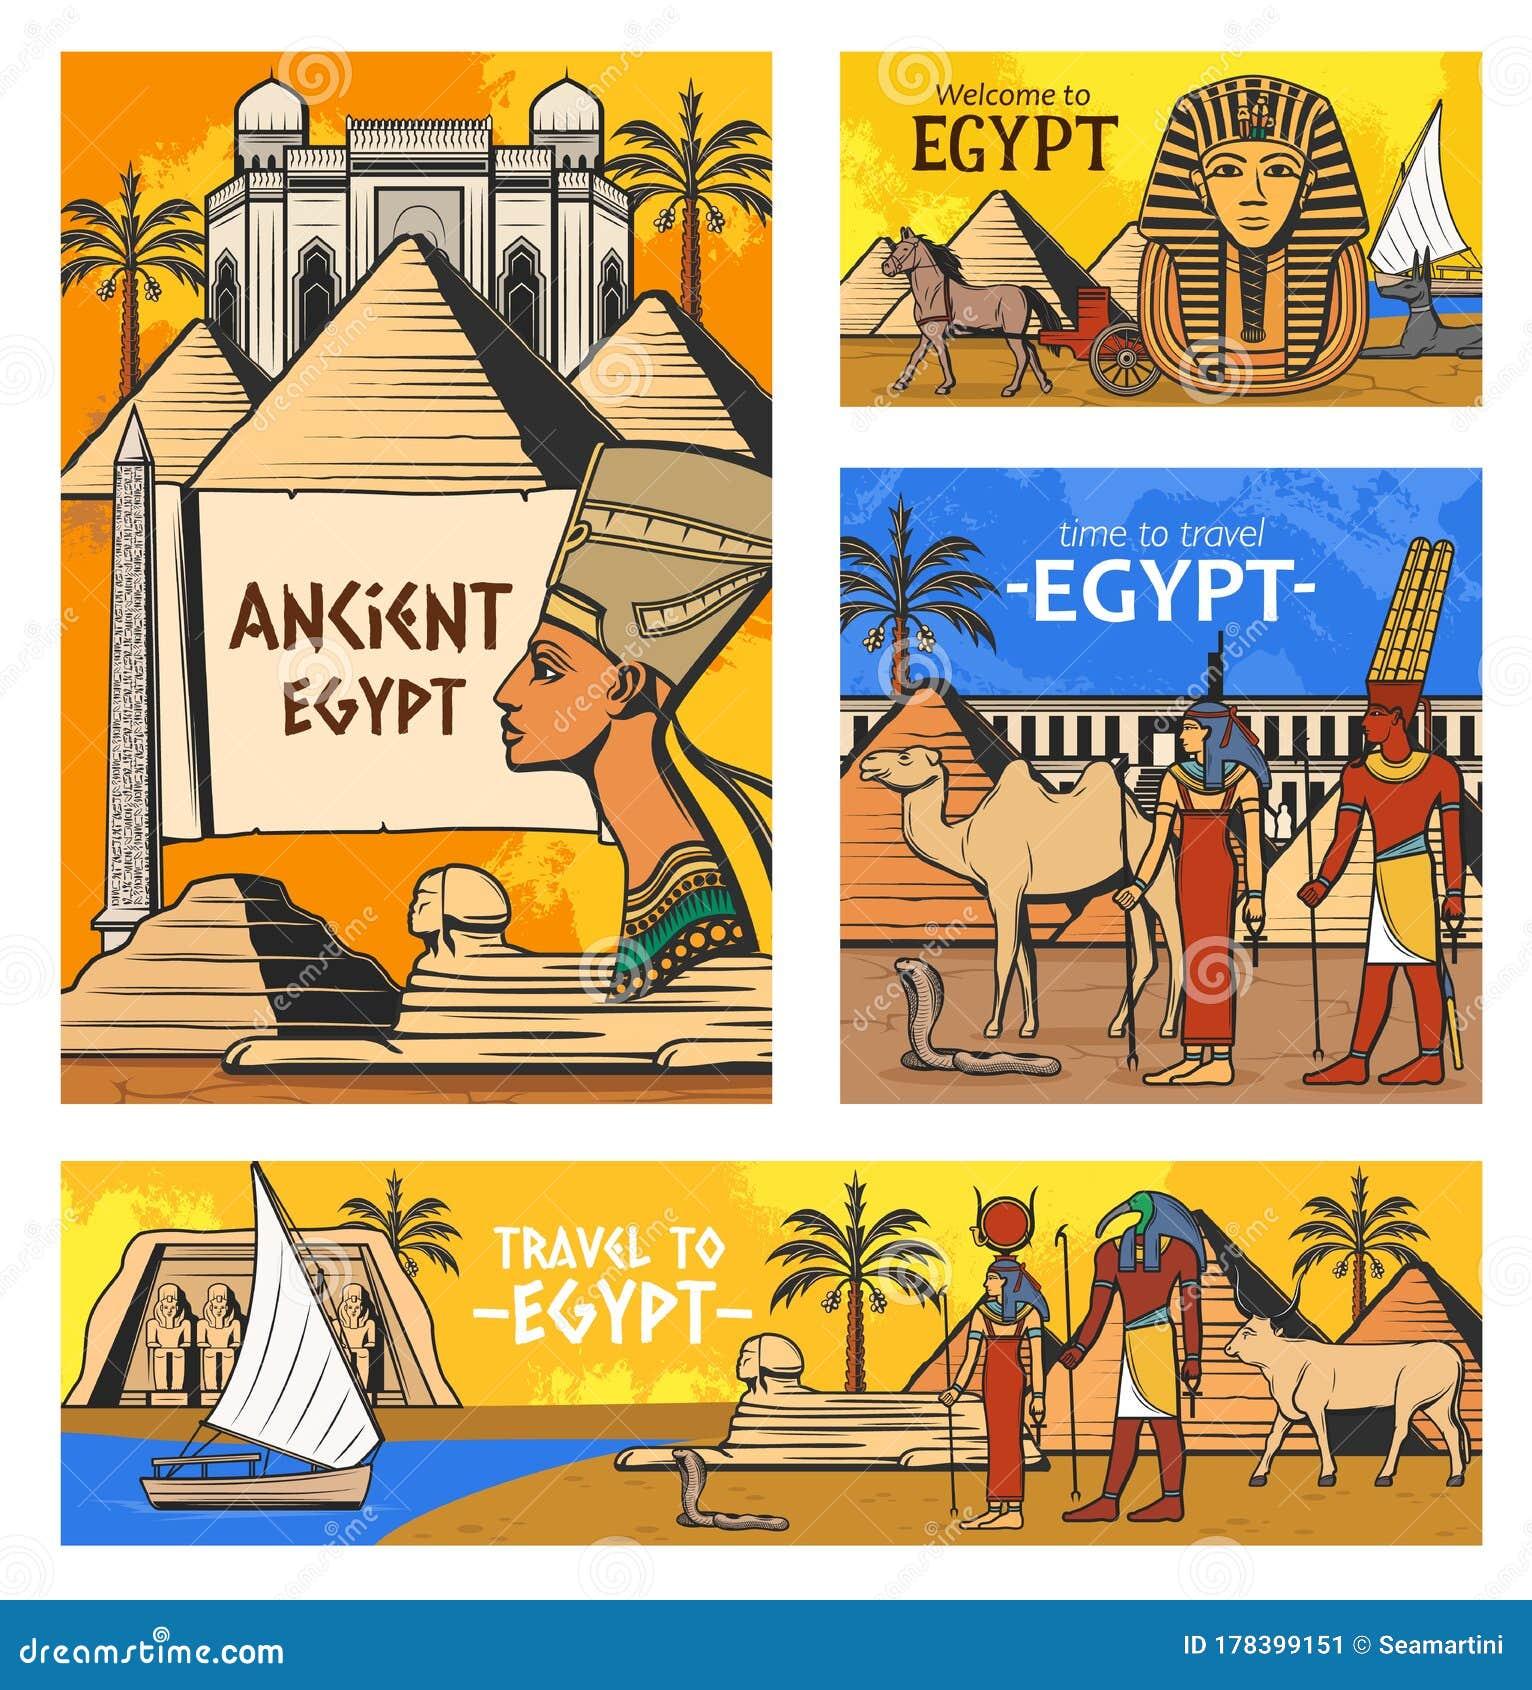 PHAROAH ANUBIS EGYPT EGYPTIAN TOMB TEMPLE PYRMID SYMBOLS TUTANKHAMUN T SHIRT